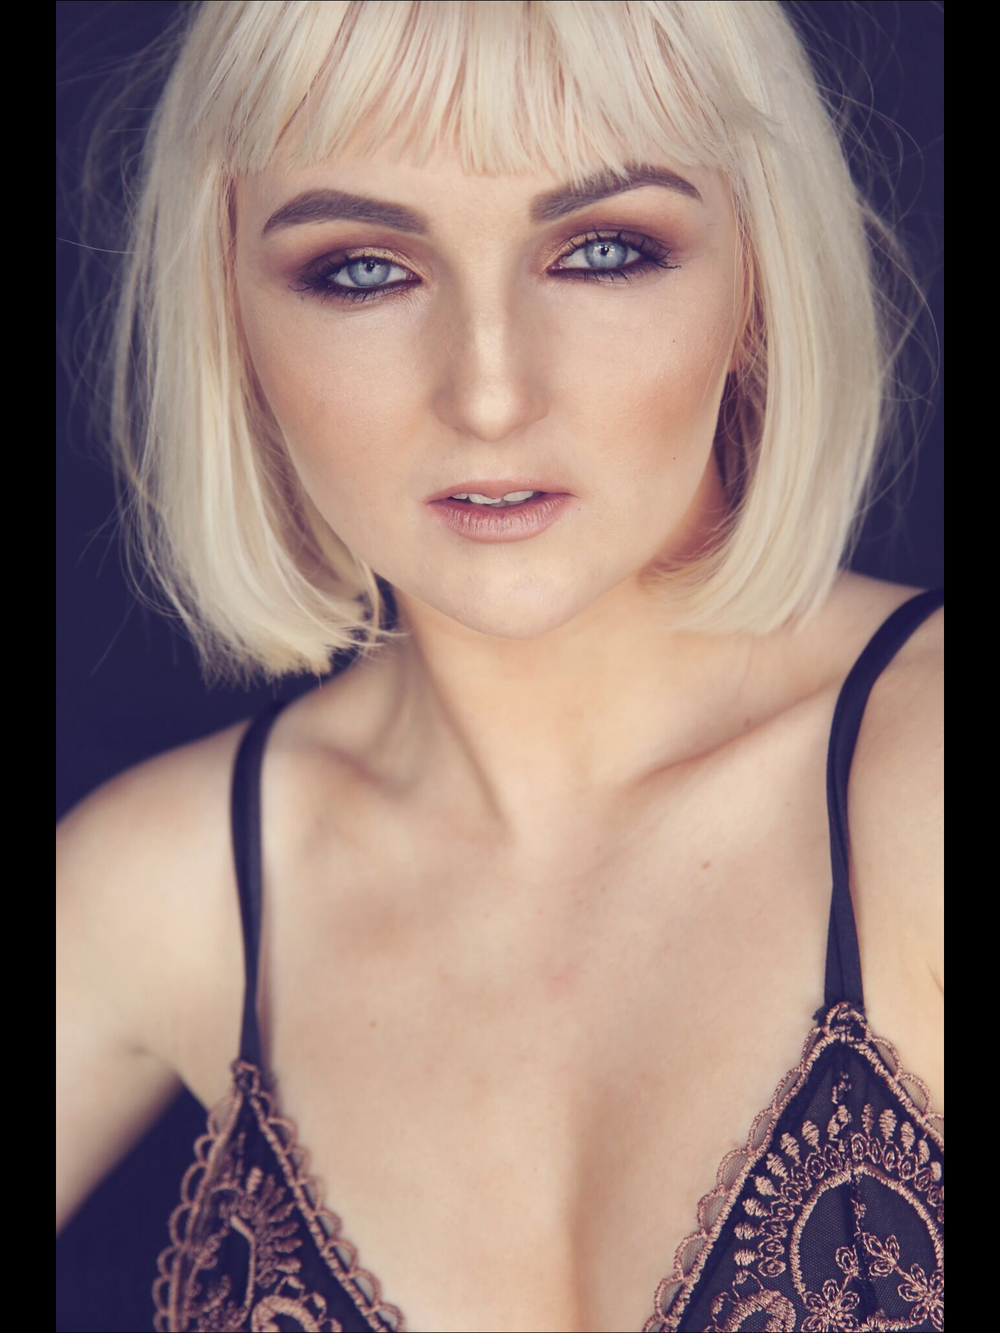 Natalie Mowat